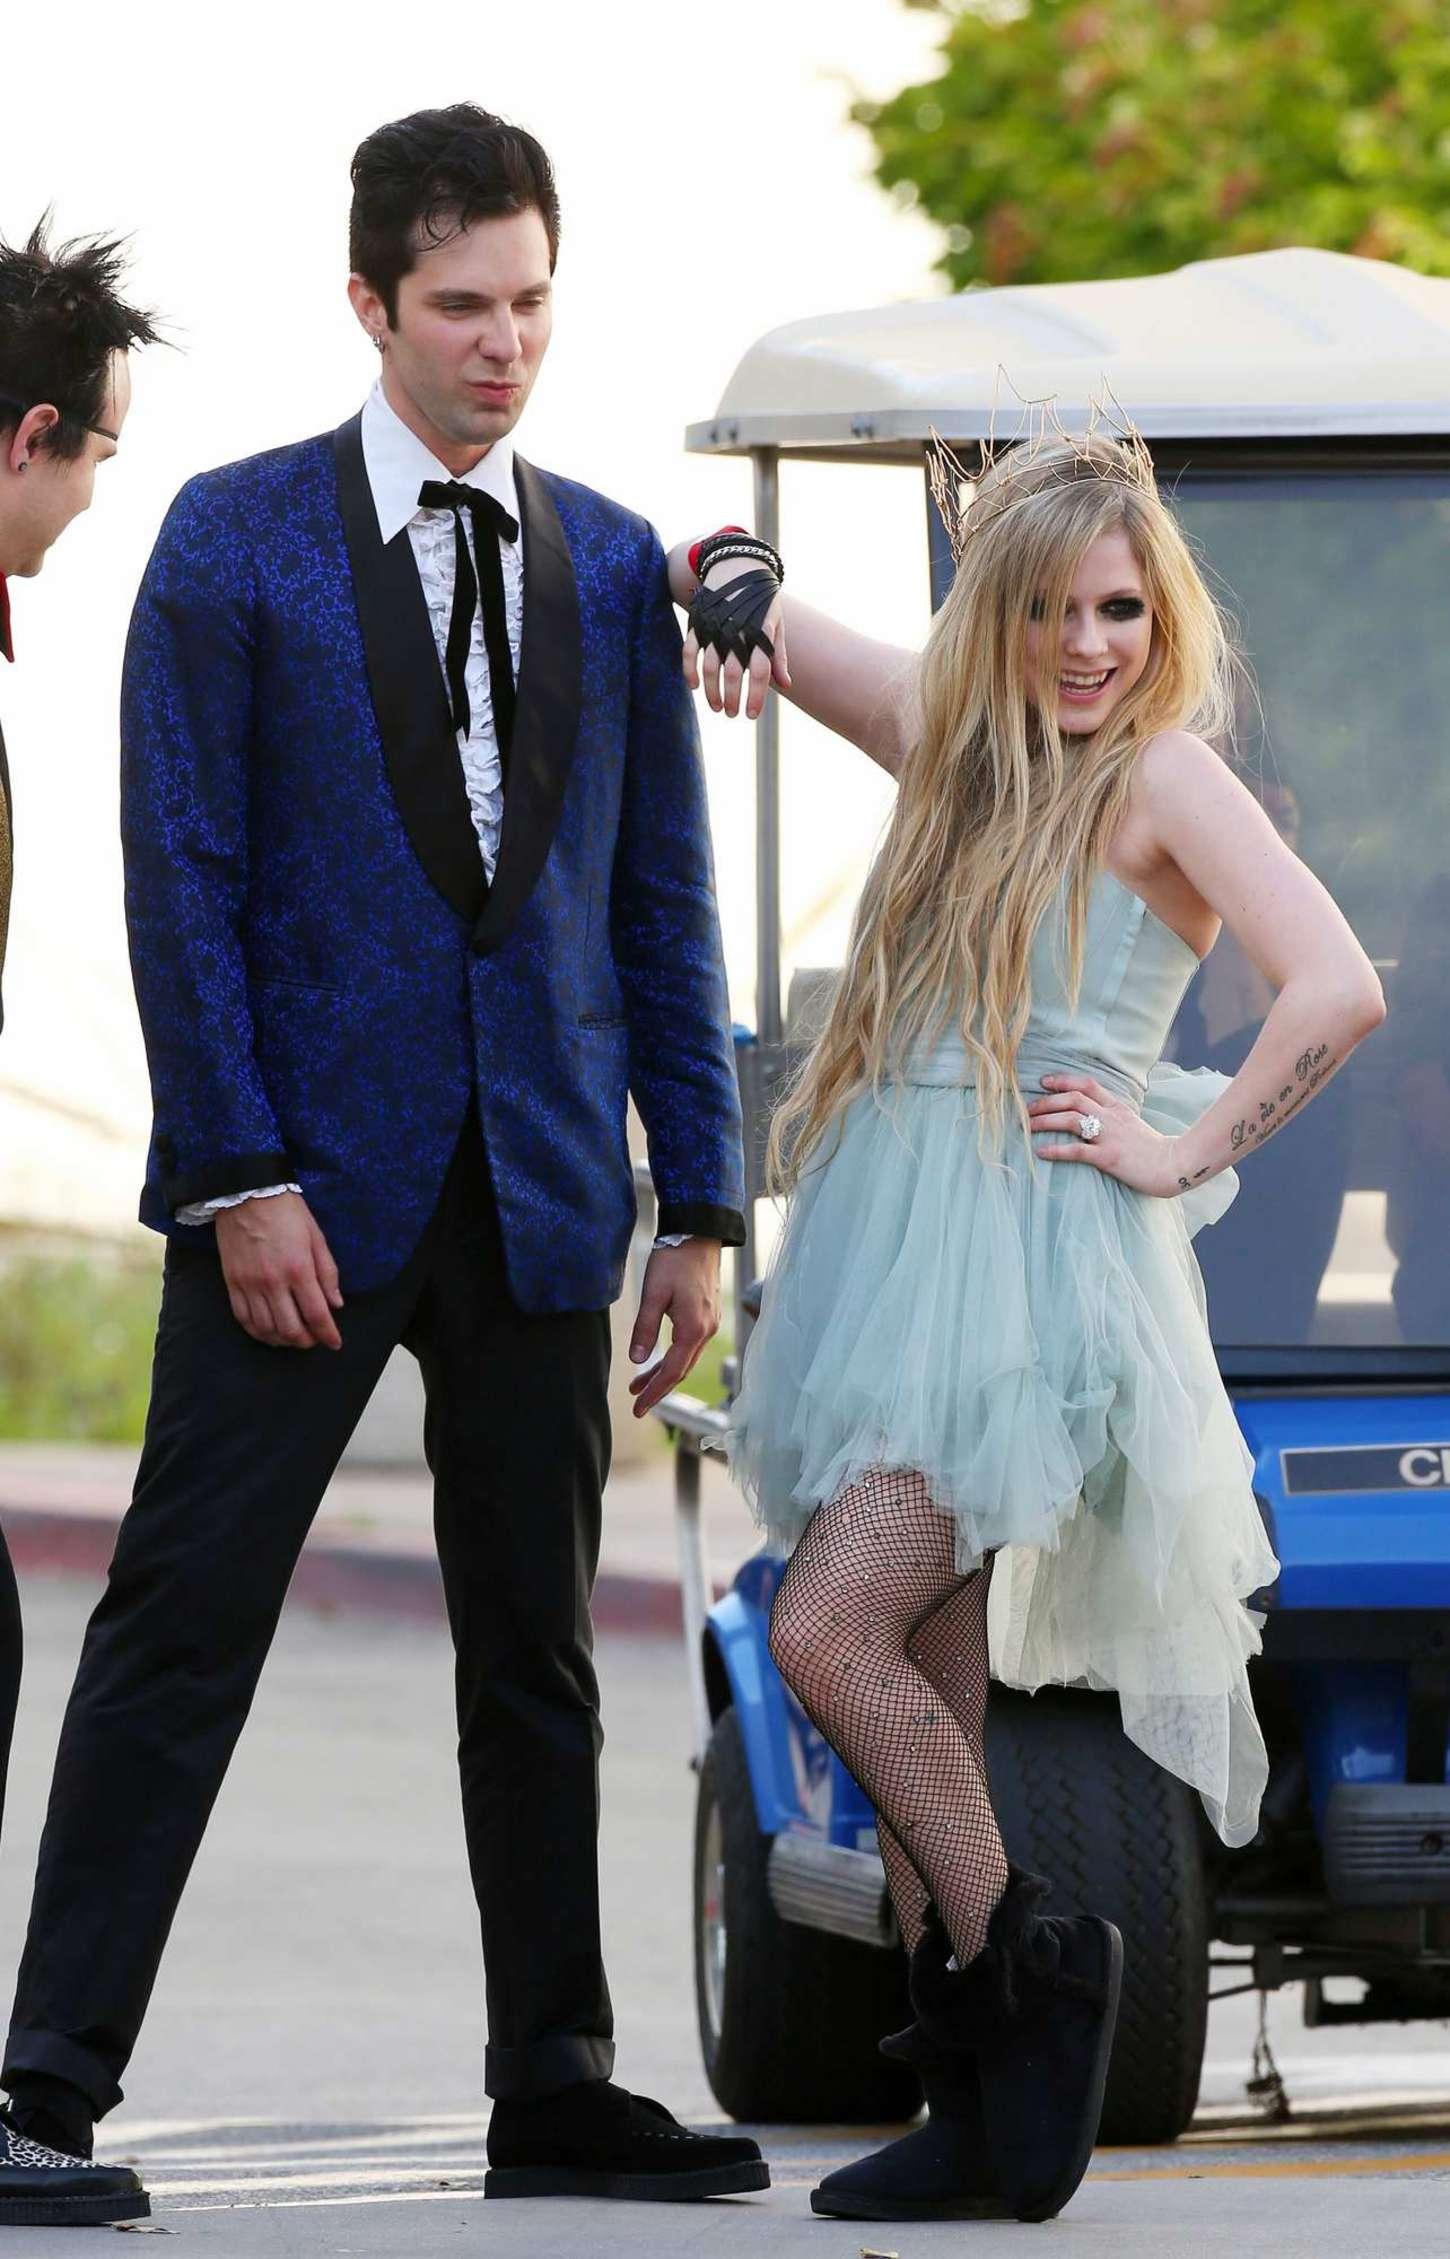 Avril Lavigne 2015 : Avril Lavigne: Filming New Music Video -05